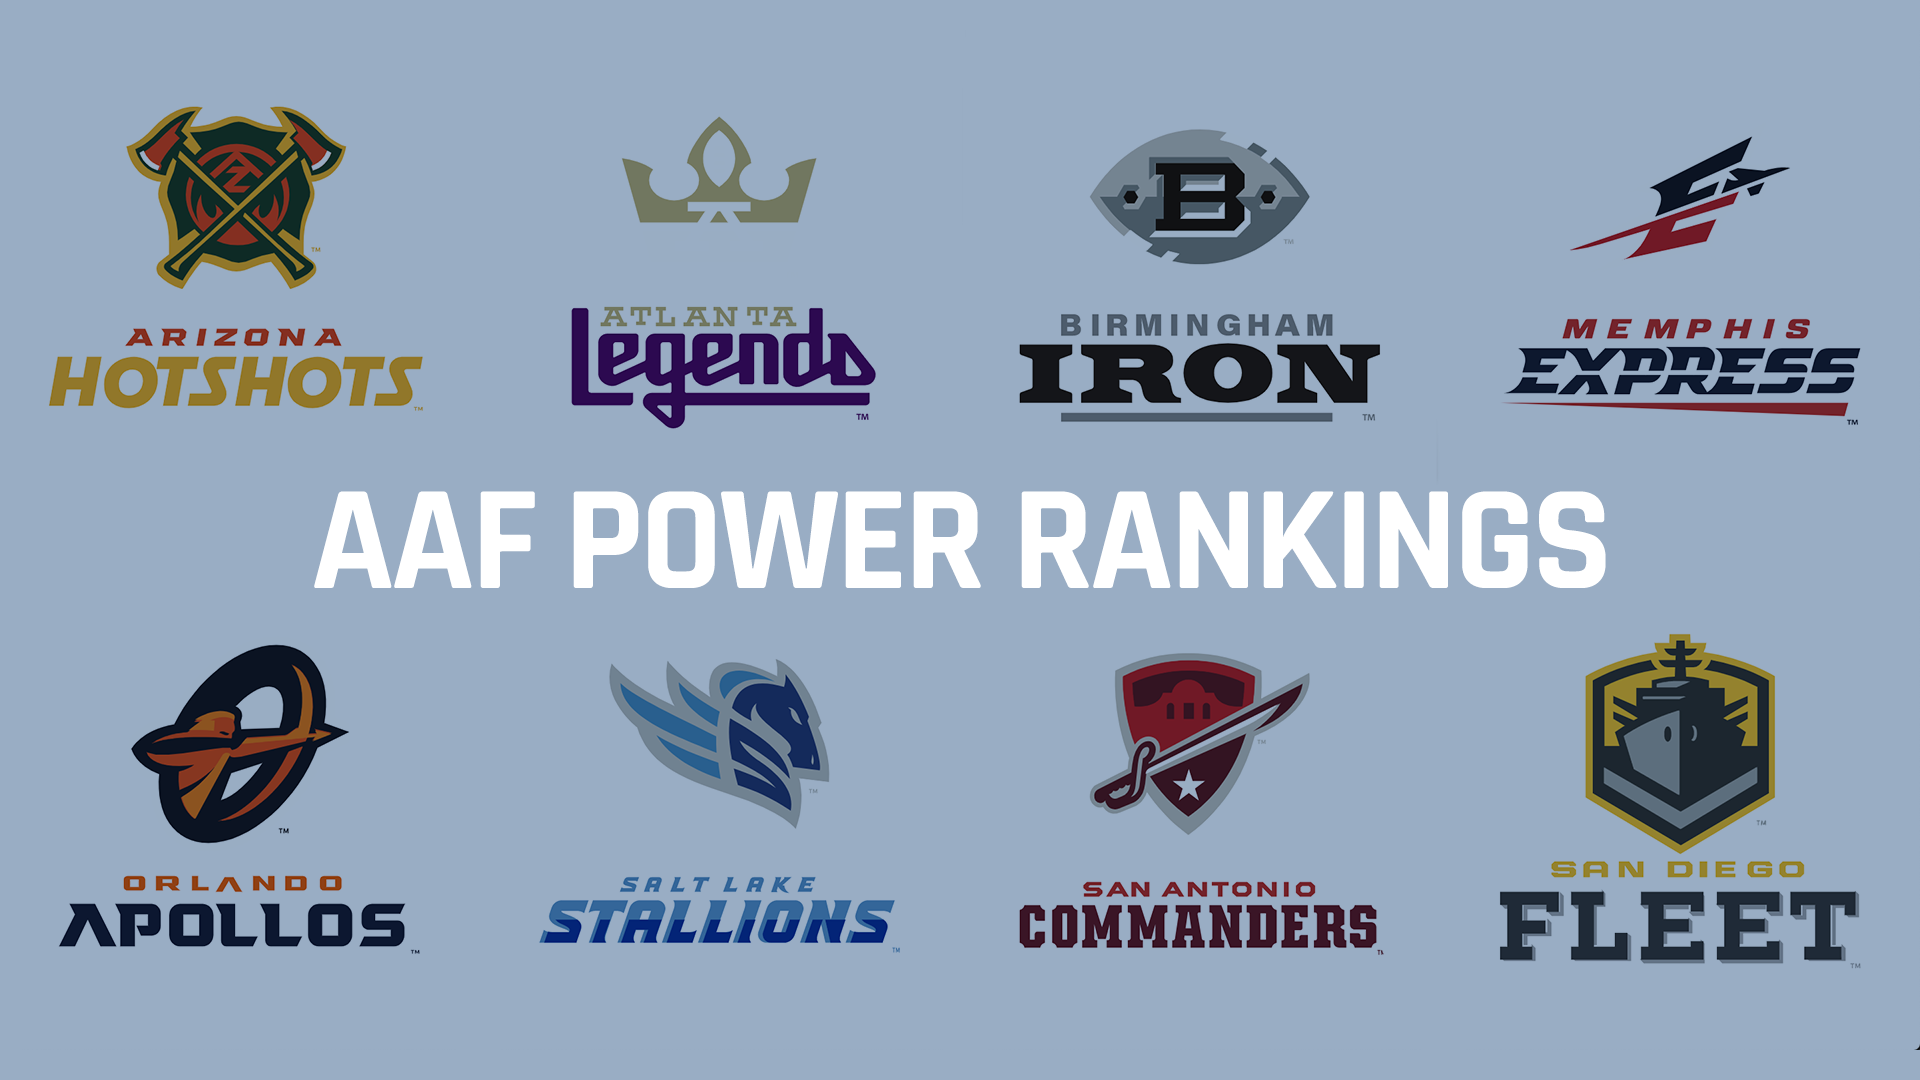 Aaf-week-3-power-rankings-ftr_udxnw6ei0tu9172h428yuqt4i